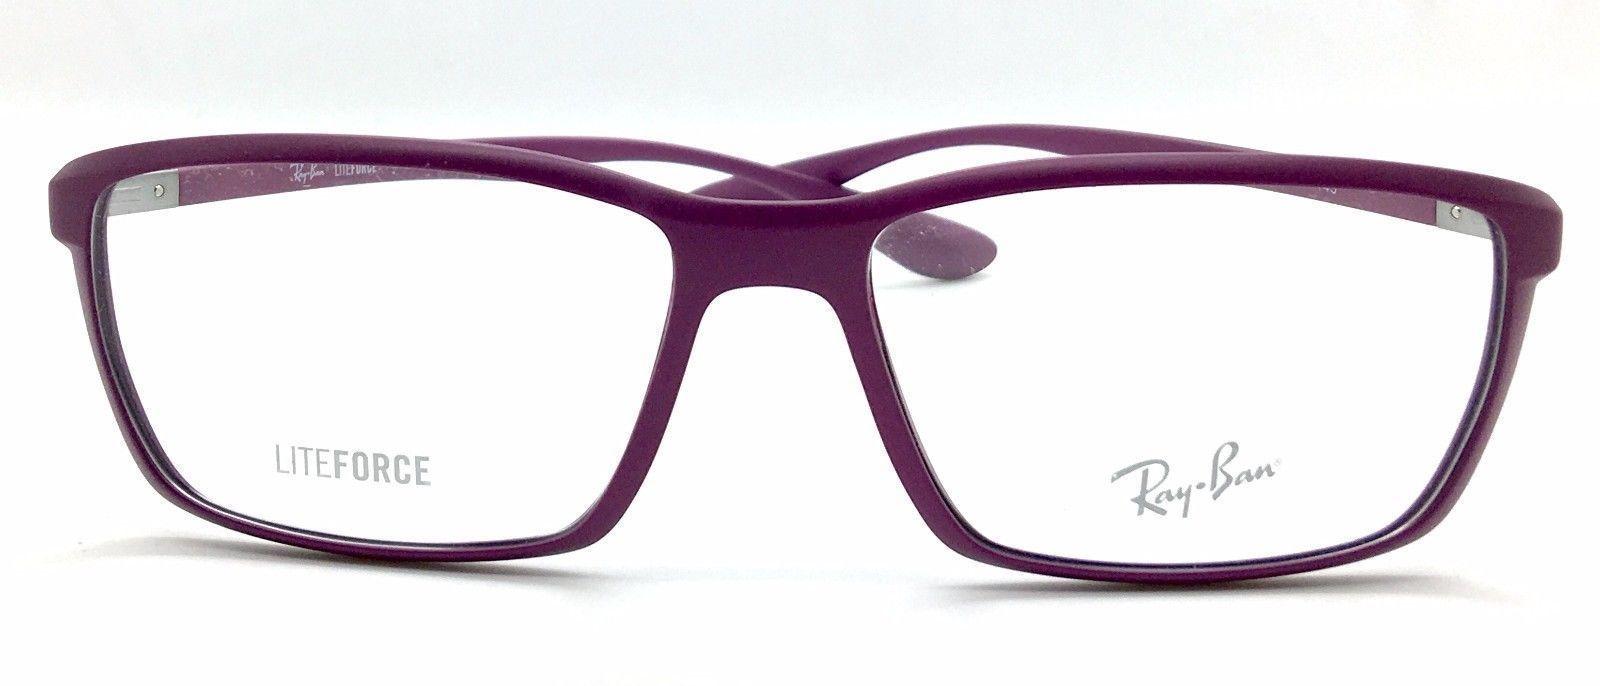 fb25f70359f Ray Ban RB 7018 5253 LightForce Eyeglasses and 50 similar items. 57